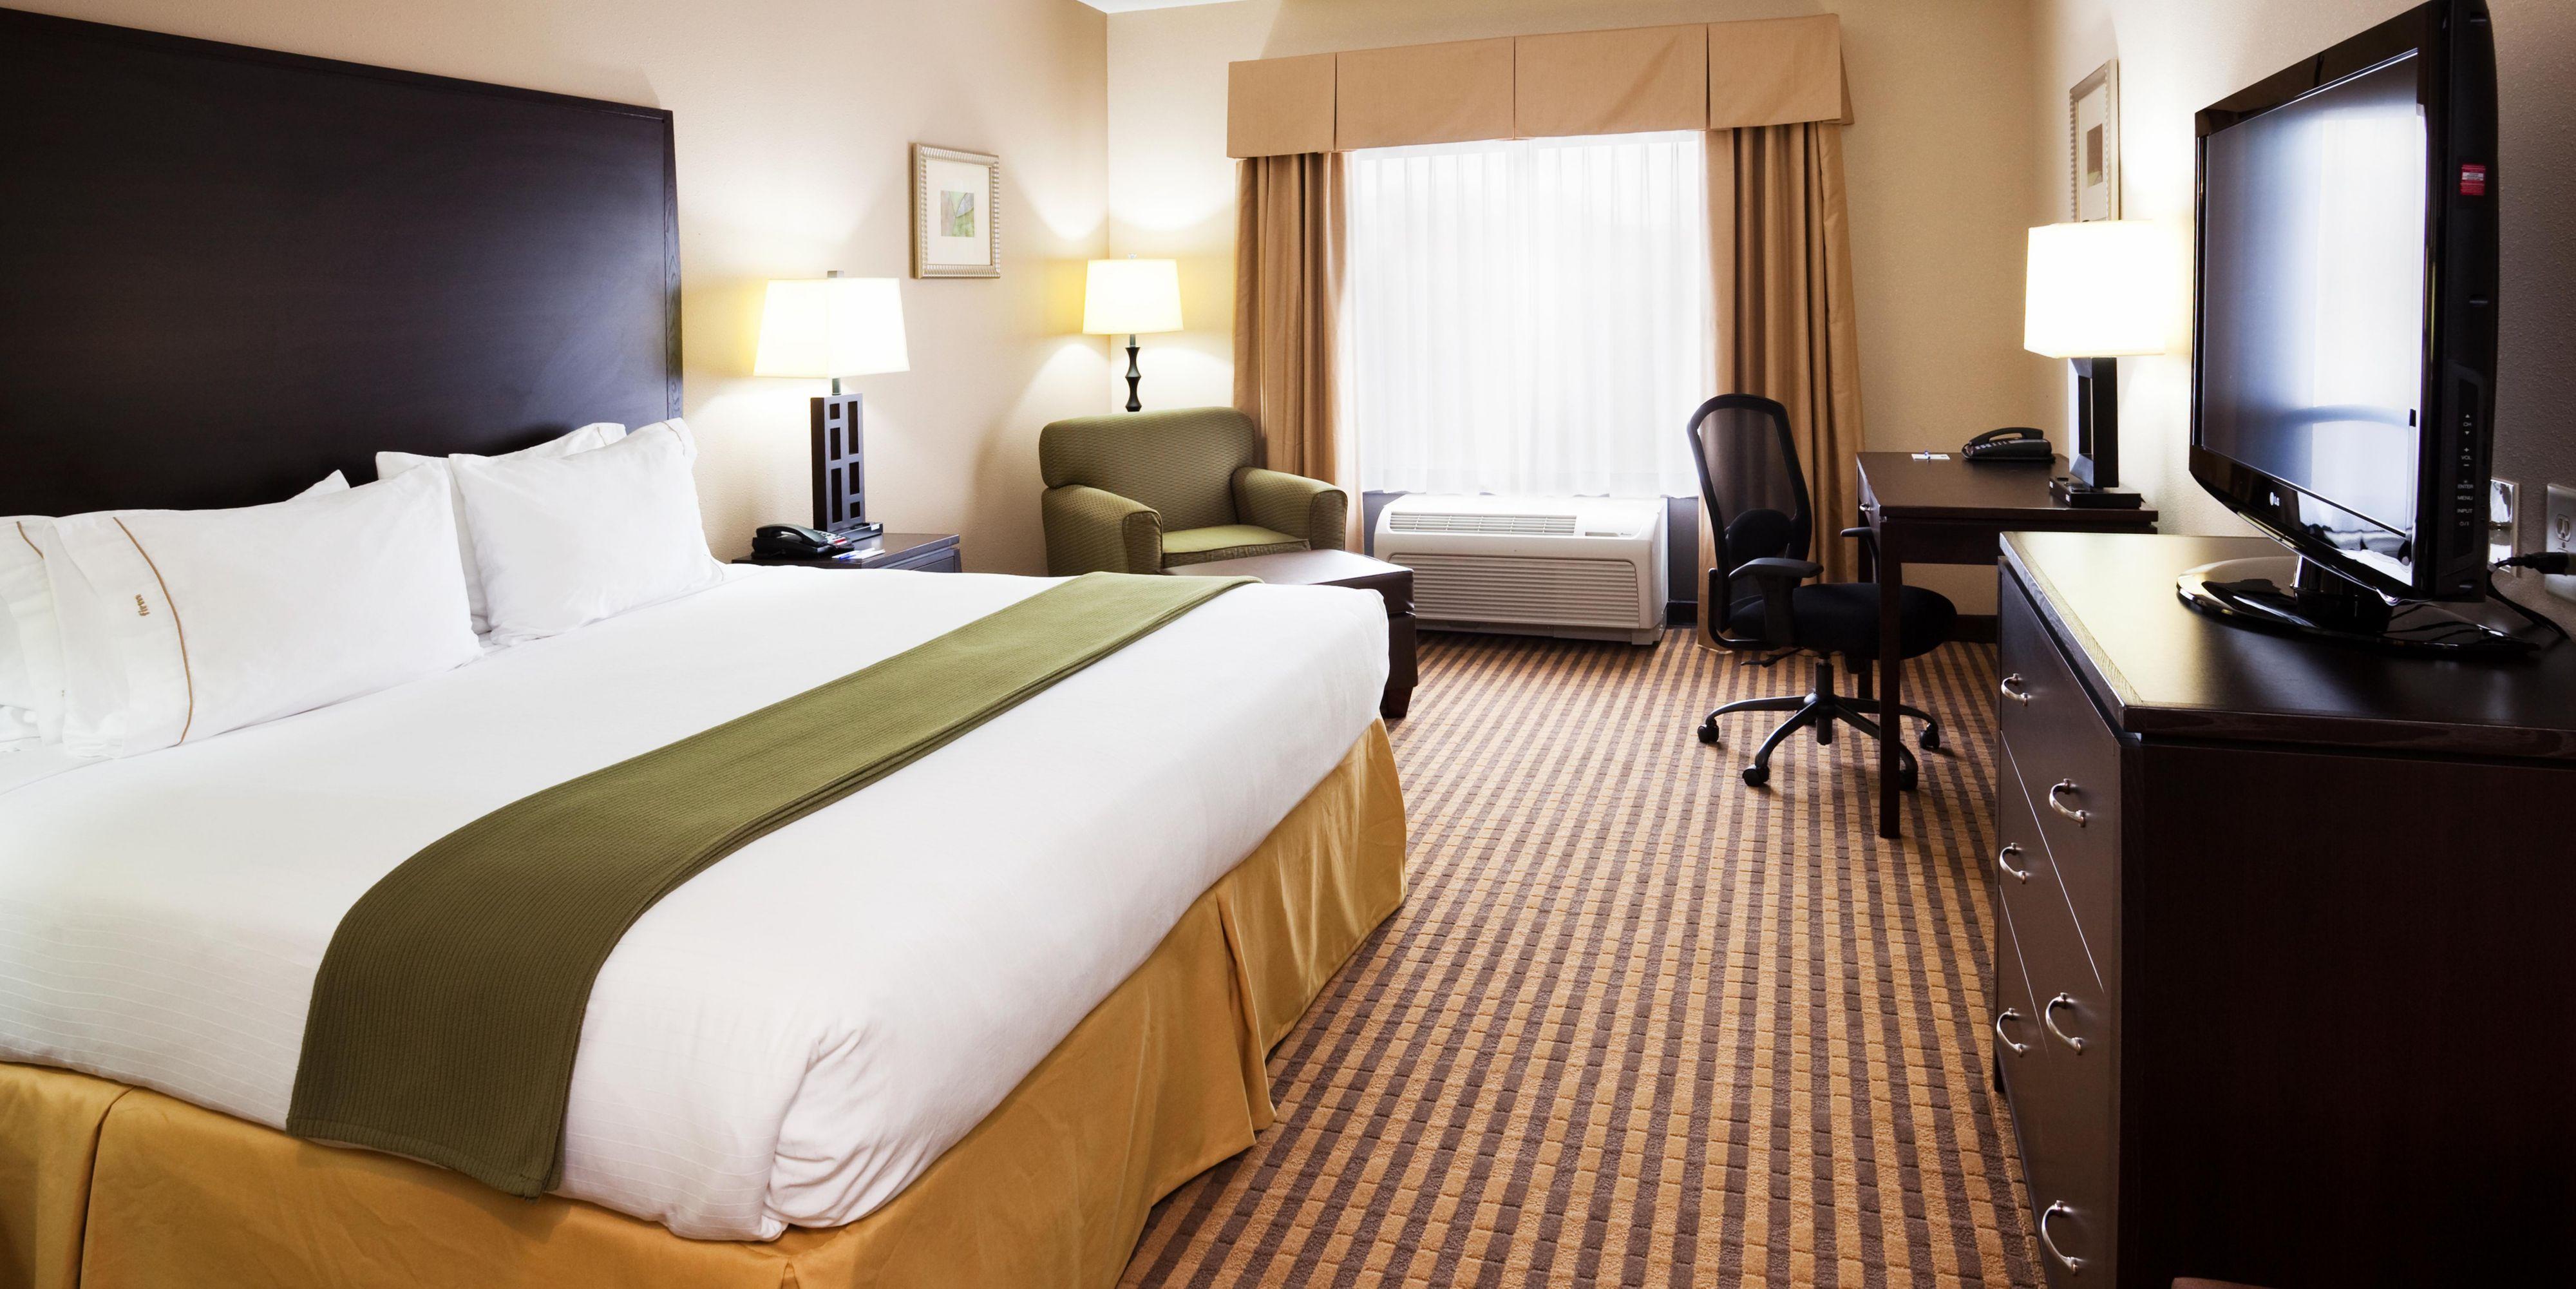 Holiday Inn Express Johnson City 4276775848 2x1